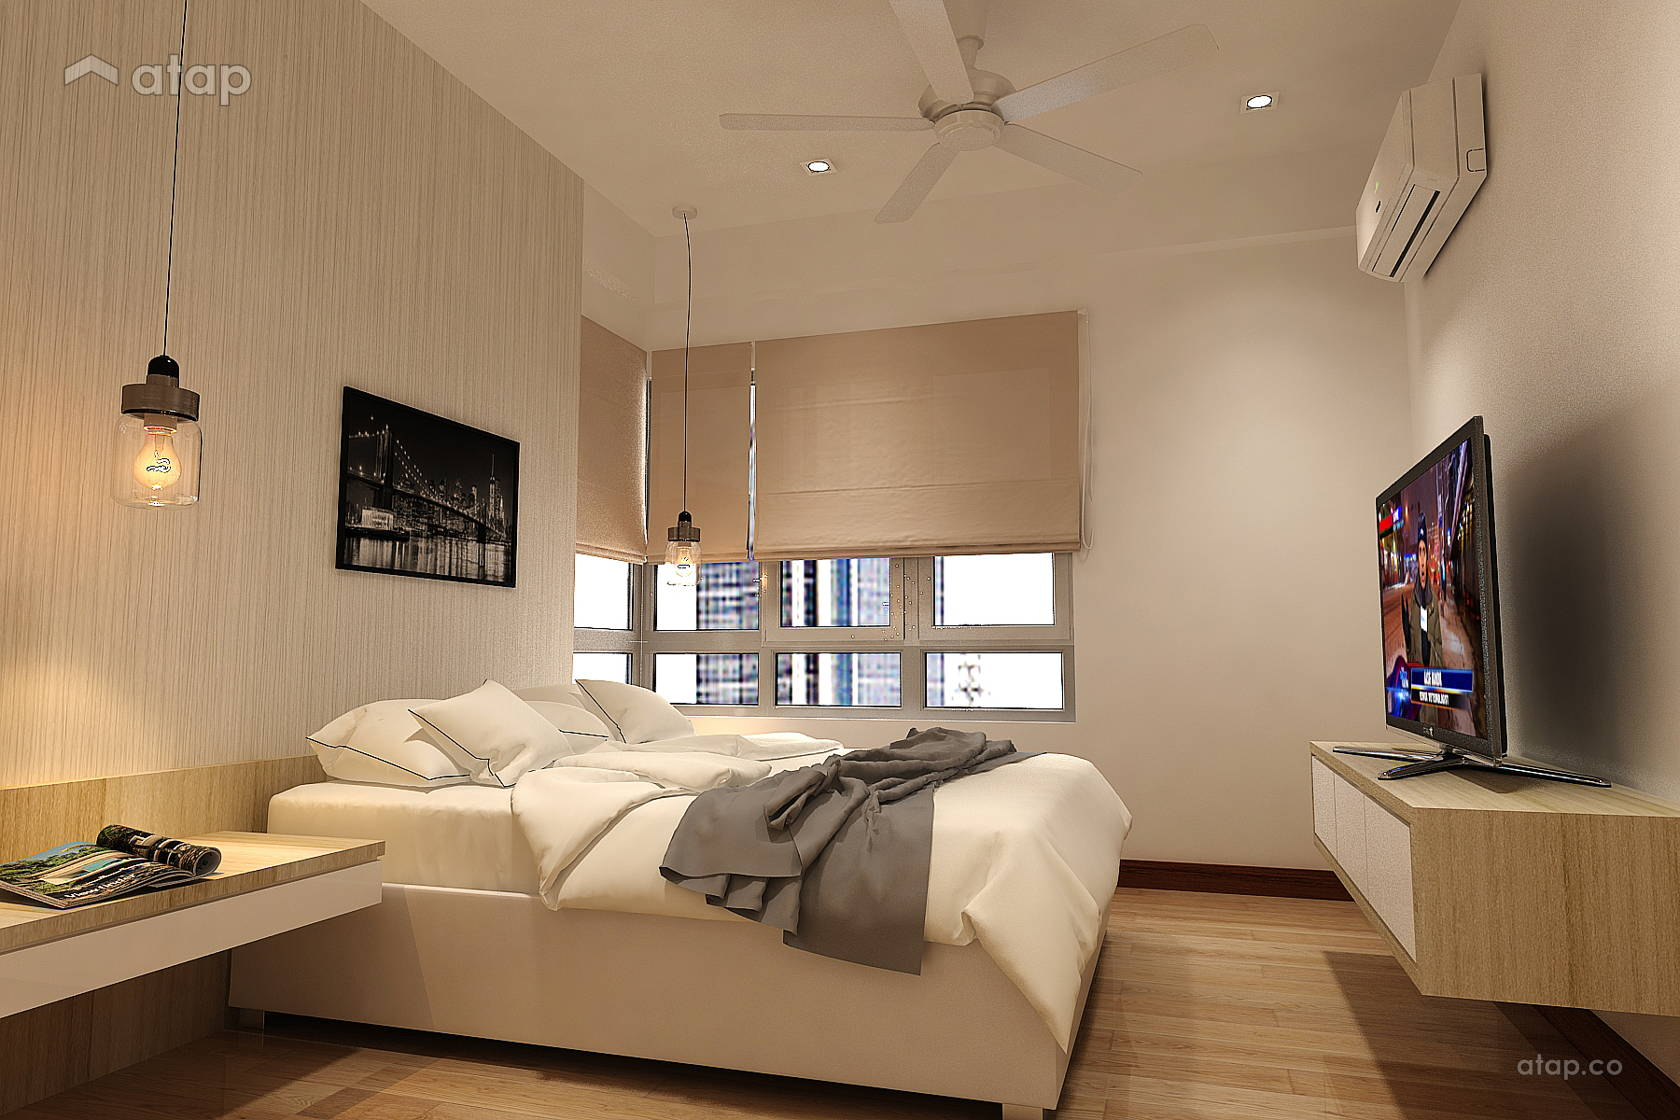 Desa Green Service Apartment Interior Design Renovation Ideas Photos And Price In Malaysia Atap Co